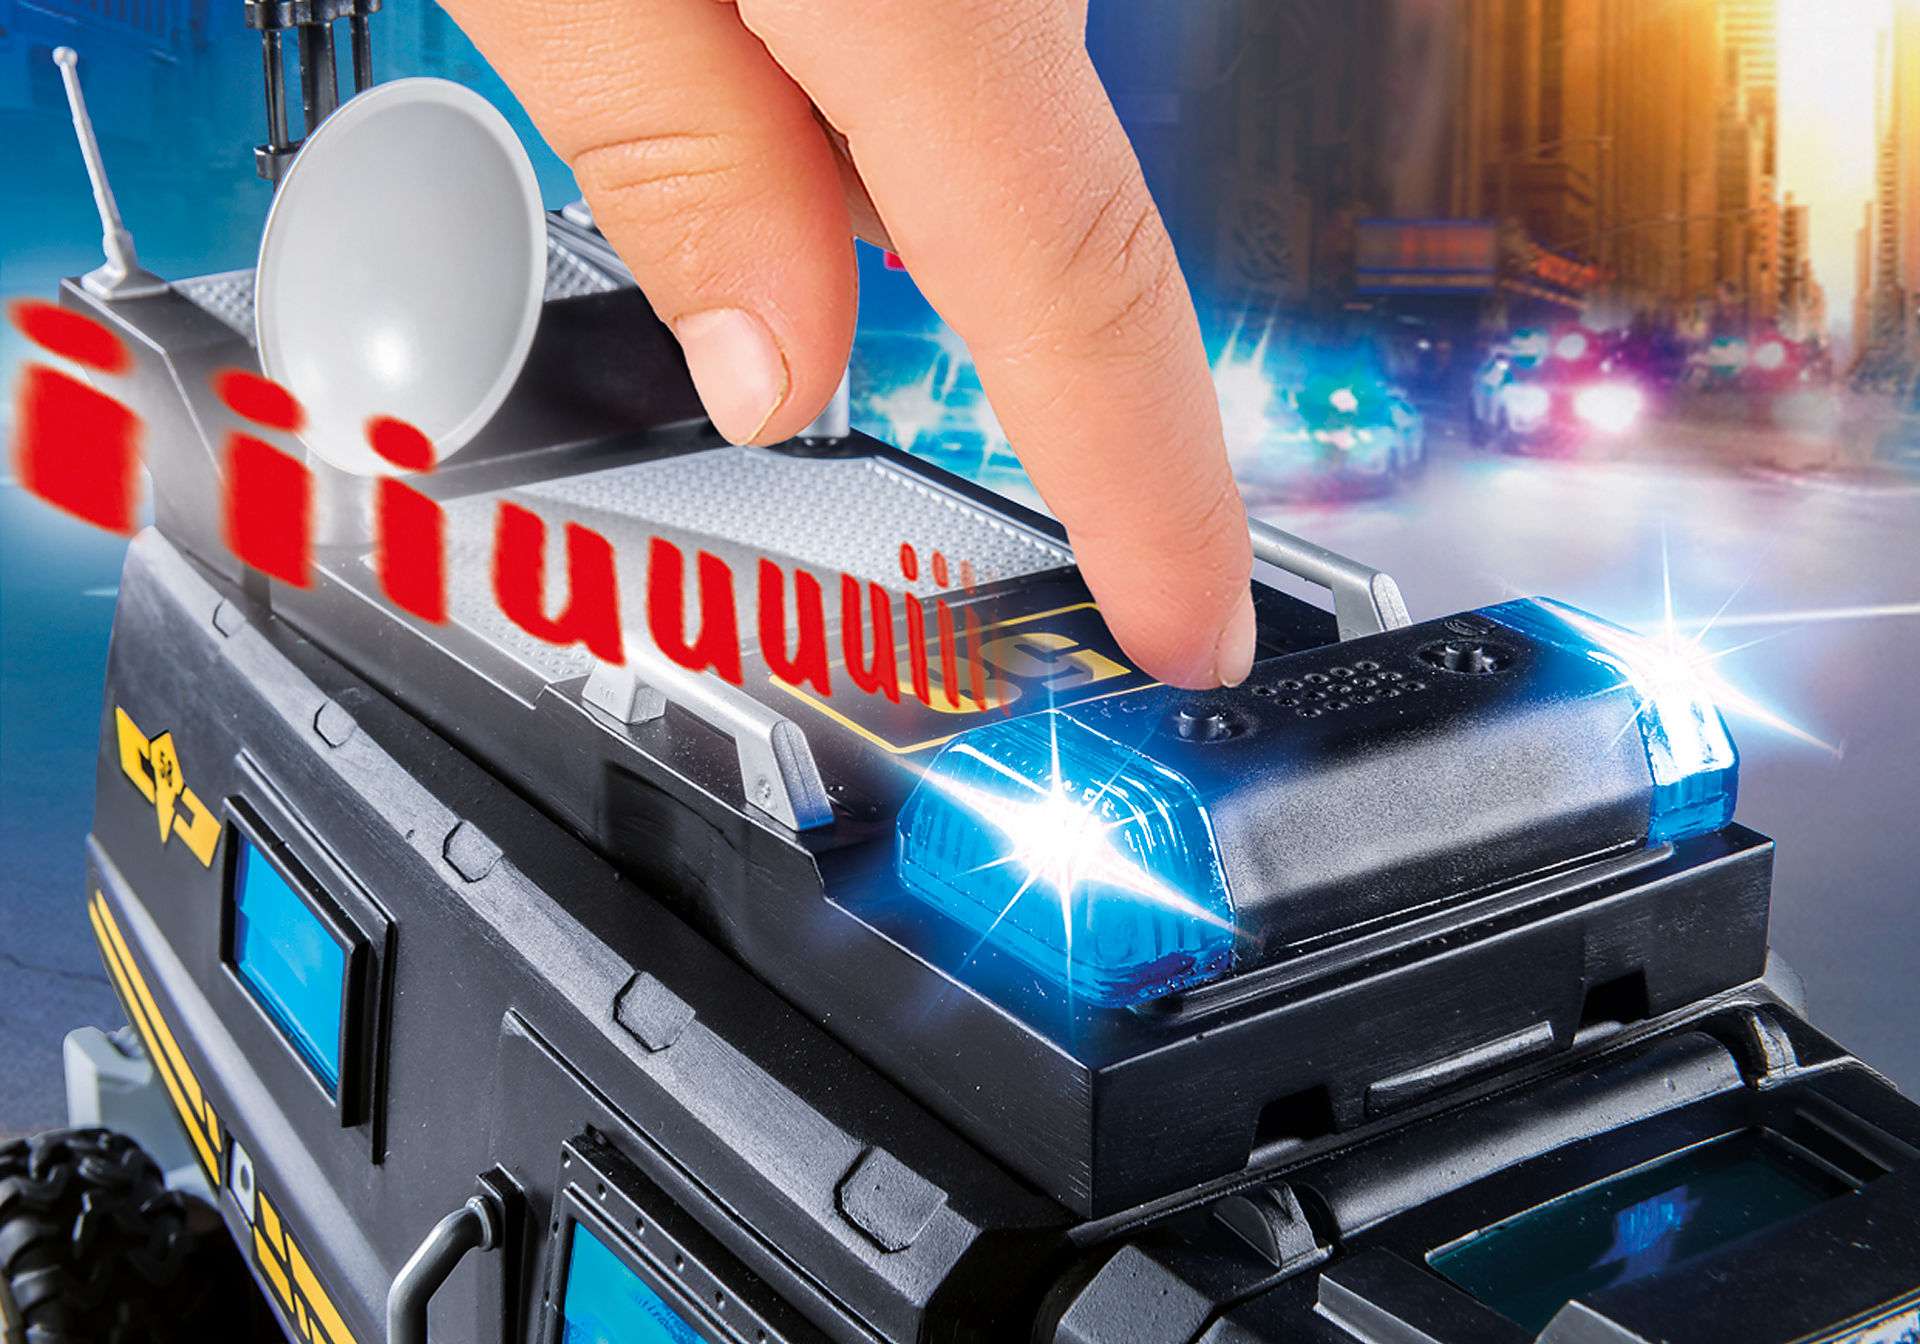 http://media.playmobil.com/i/playmobil/9360_product_extra1/SEK-Truck mit Licht und Sound